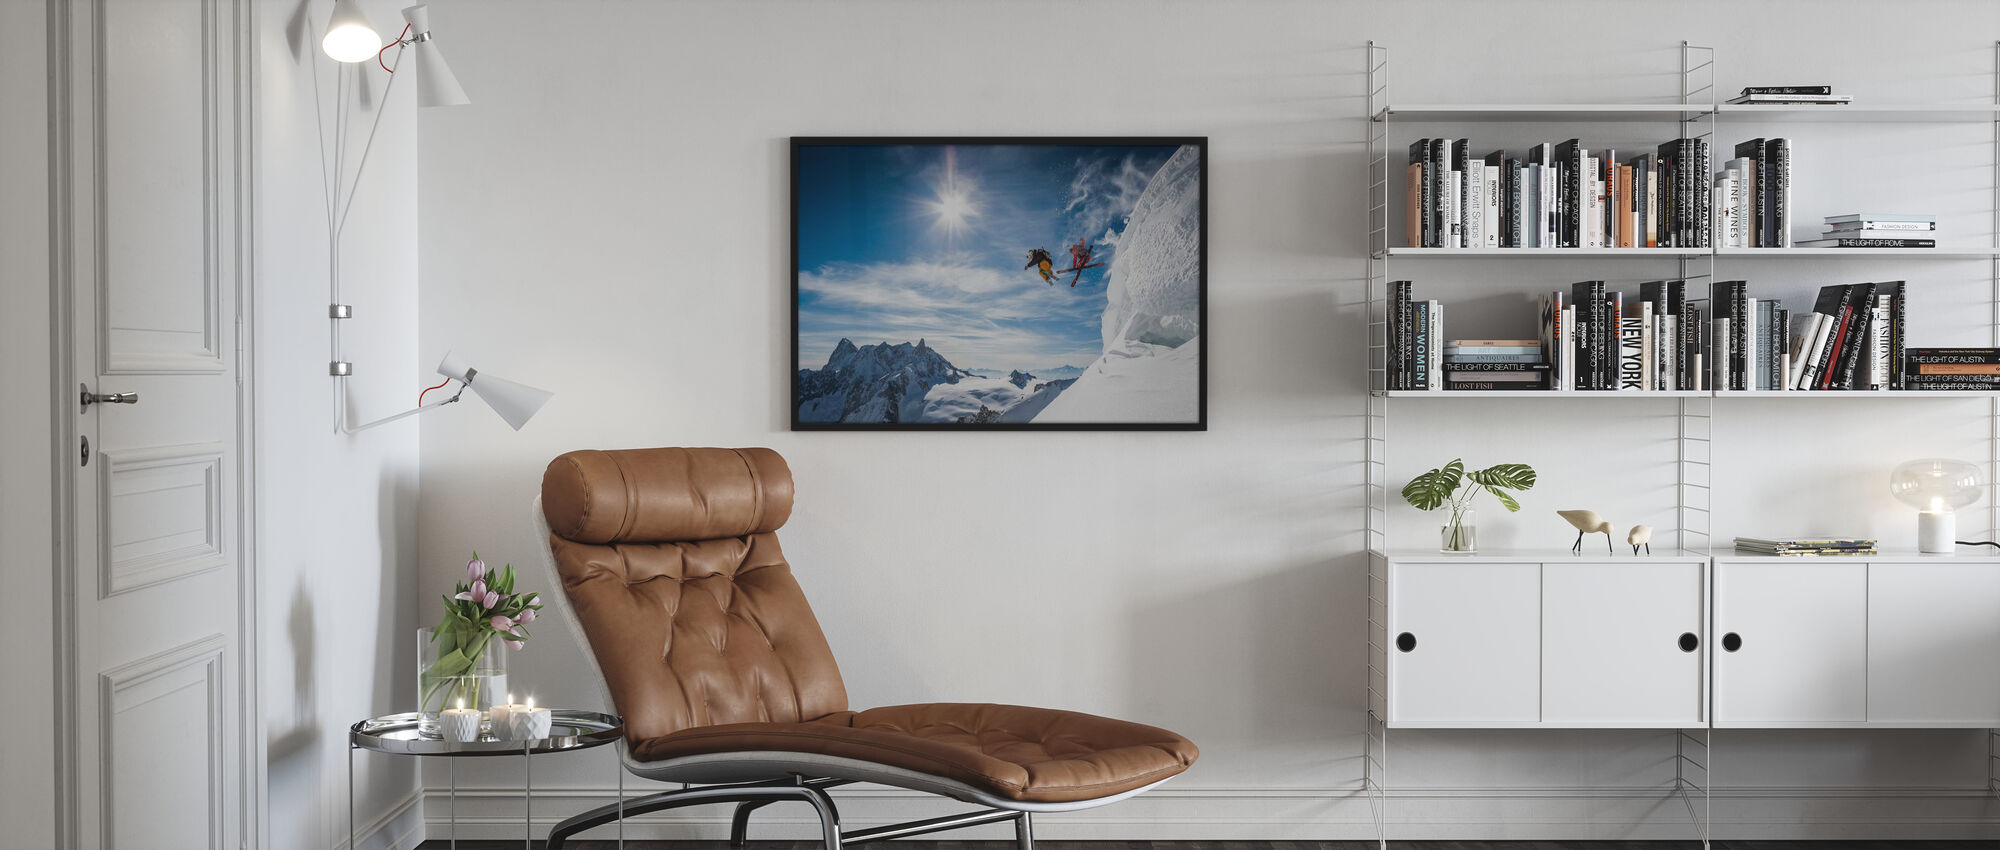 Jumping Legends - Framed print - Living Room